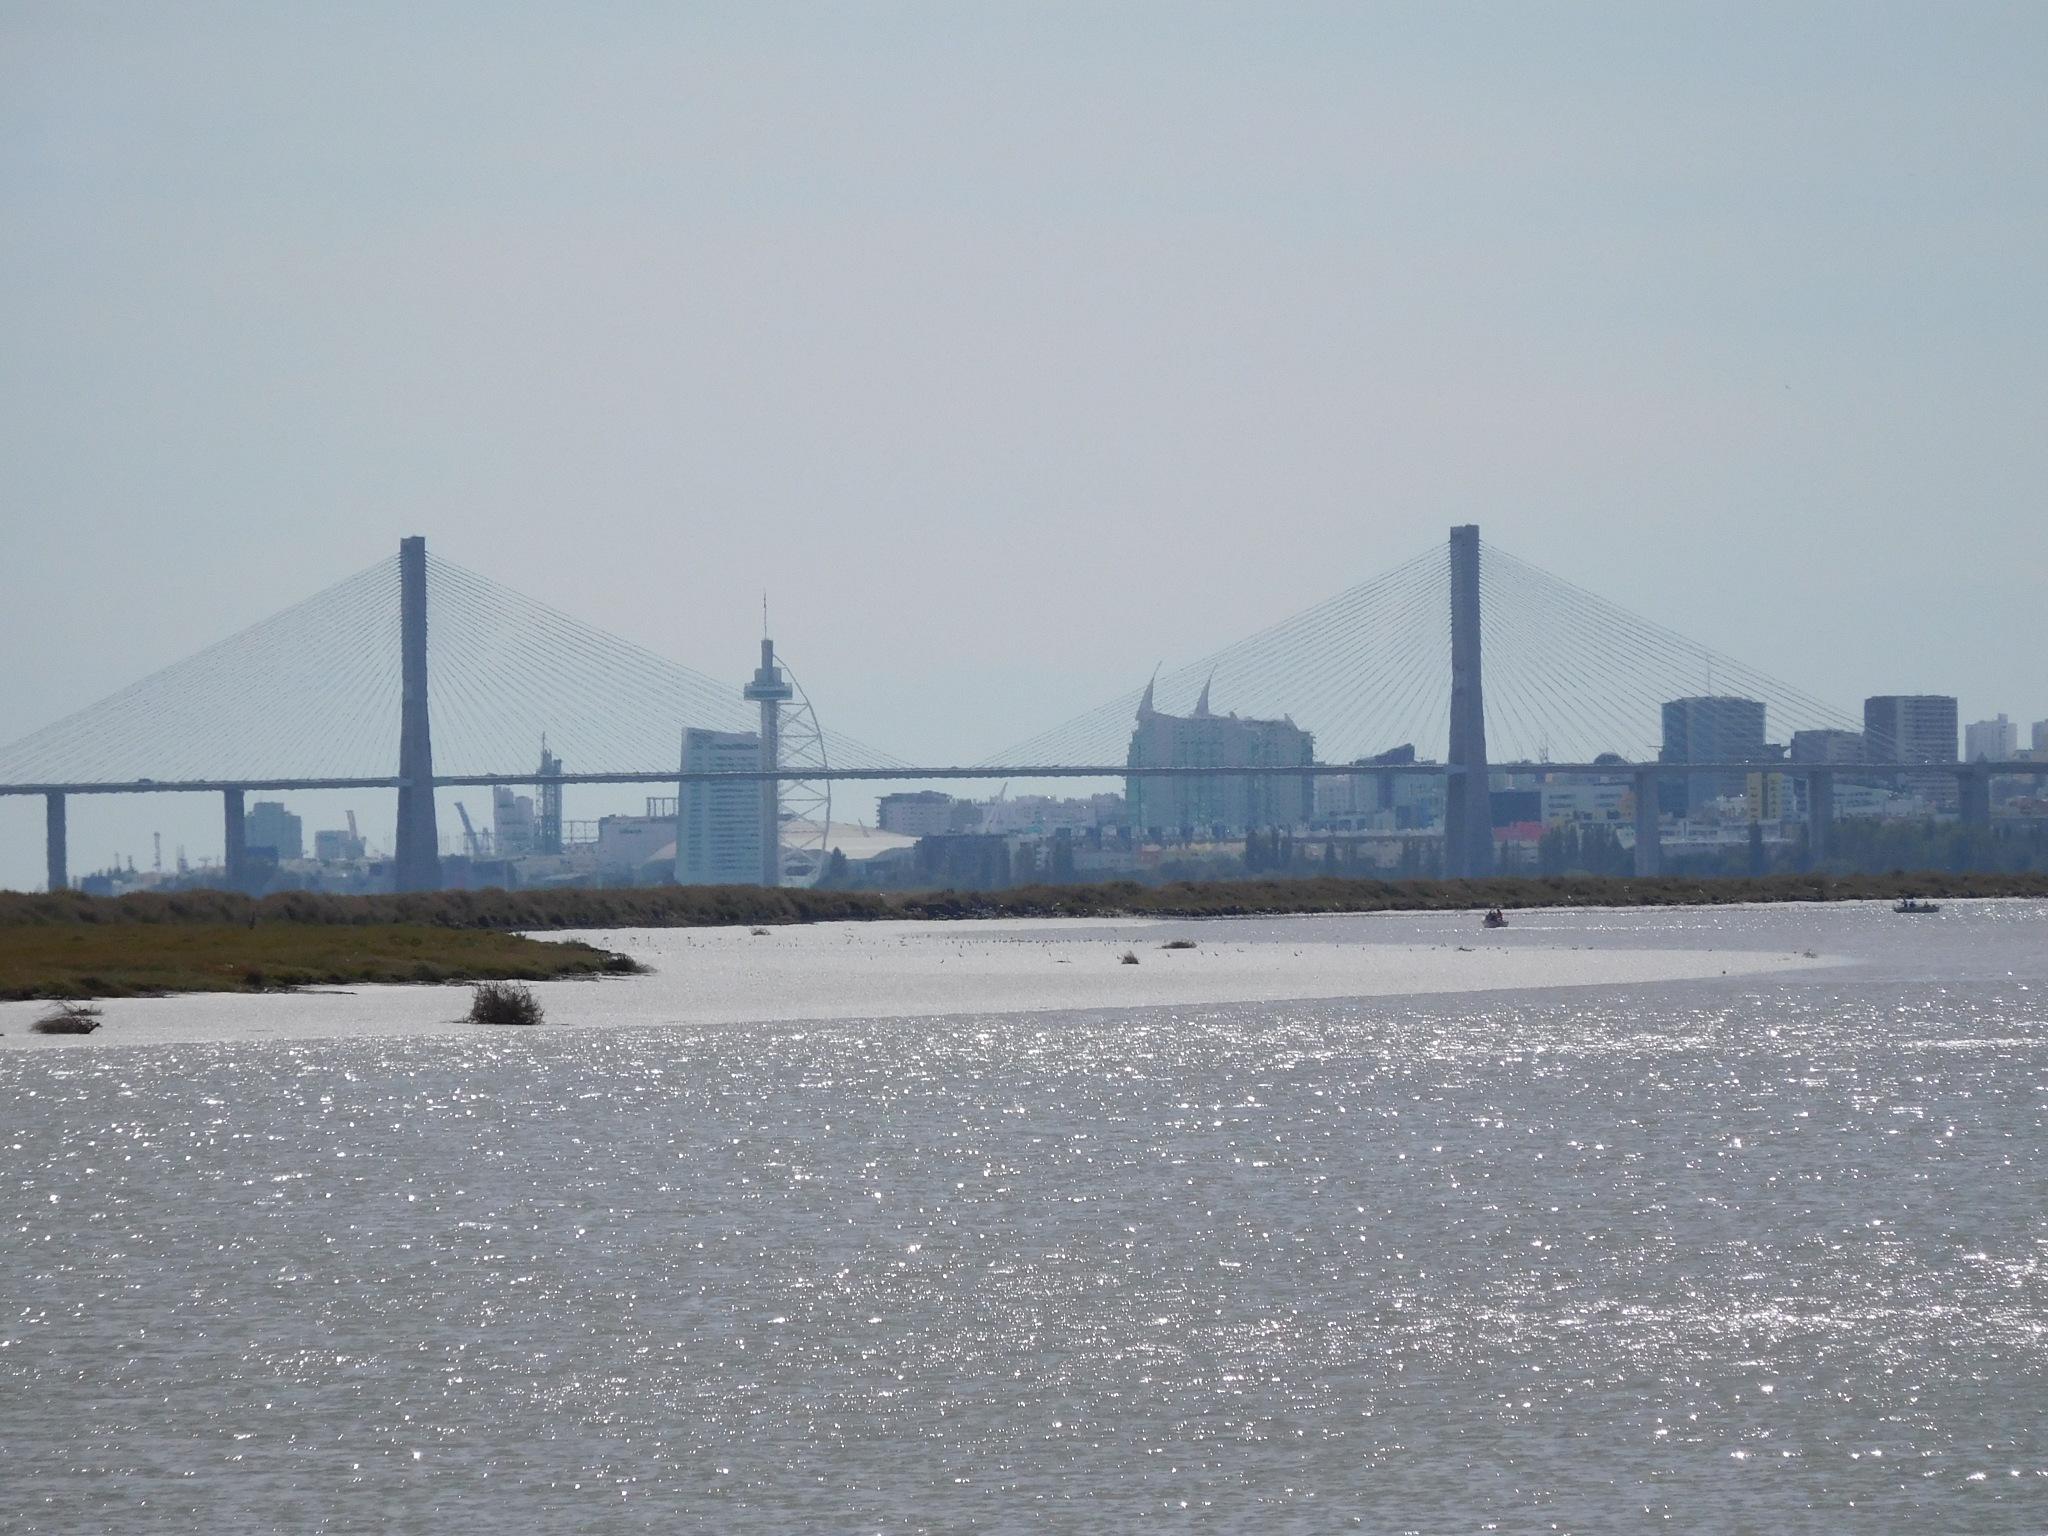 Vasco da Gama bridge by Luso